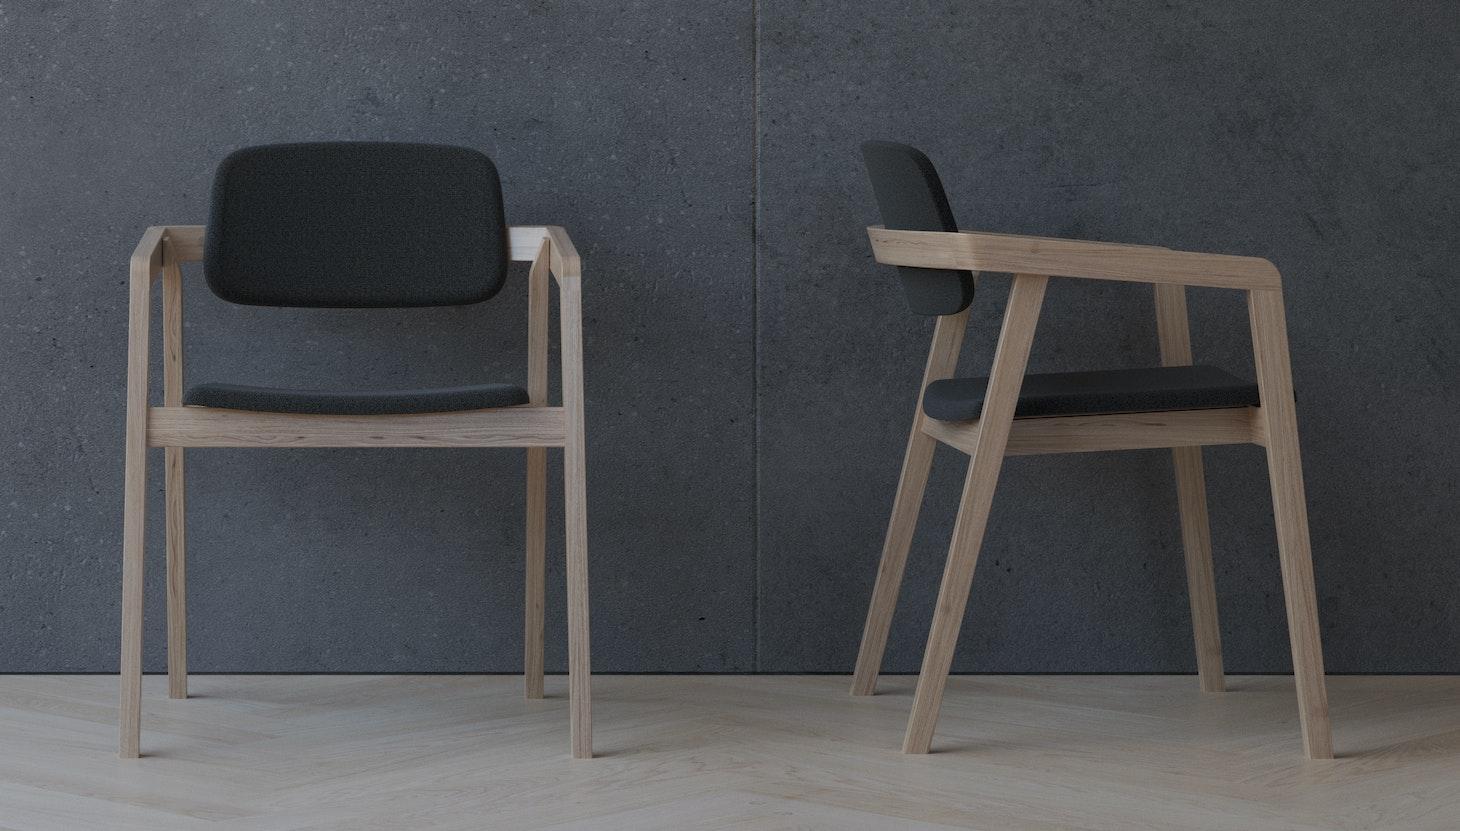 AYO - Ny stol designet specielt til plejesektoren